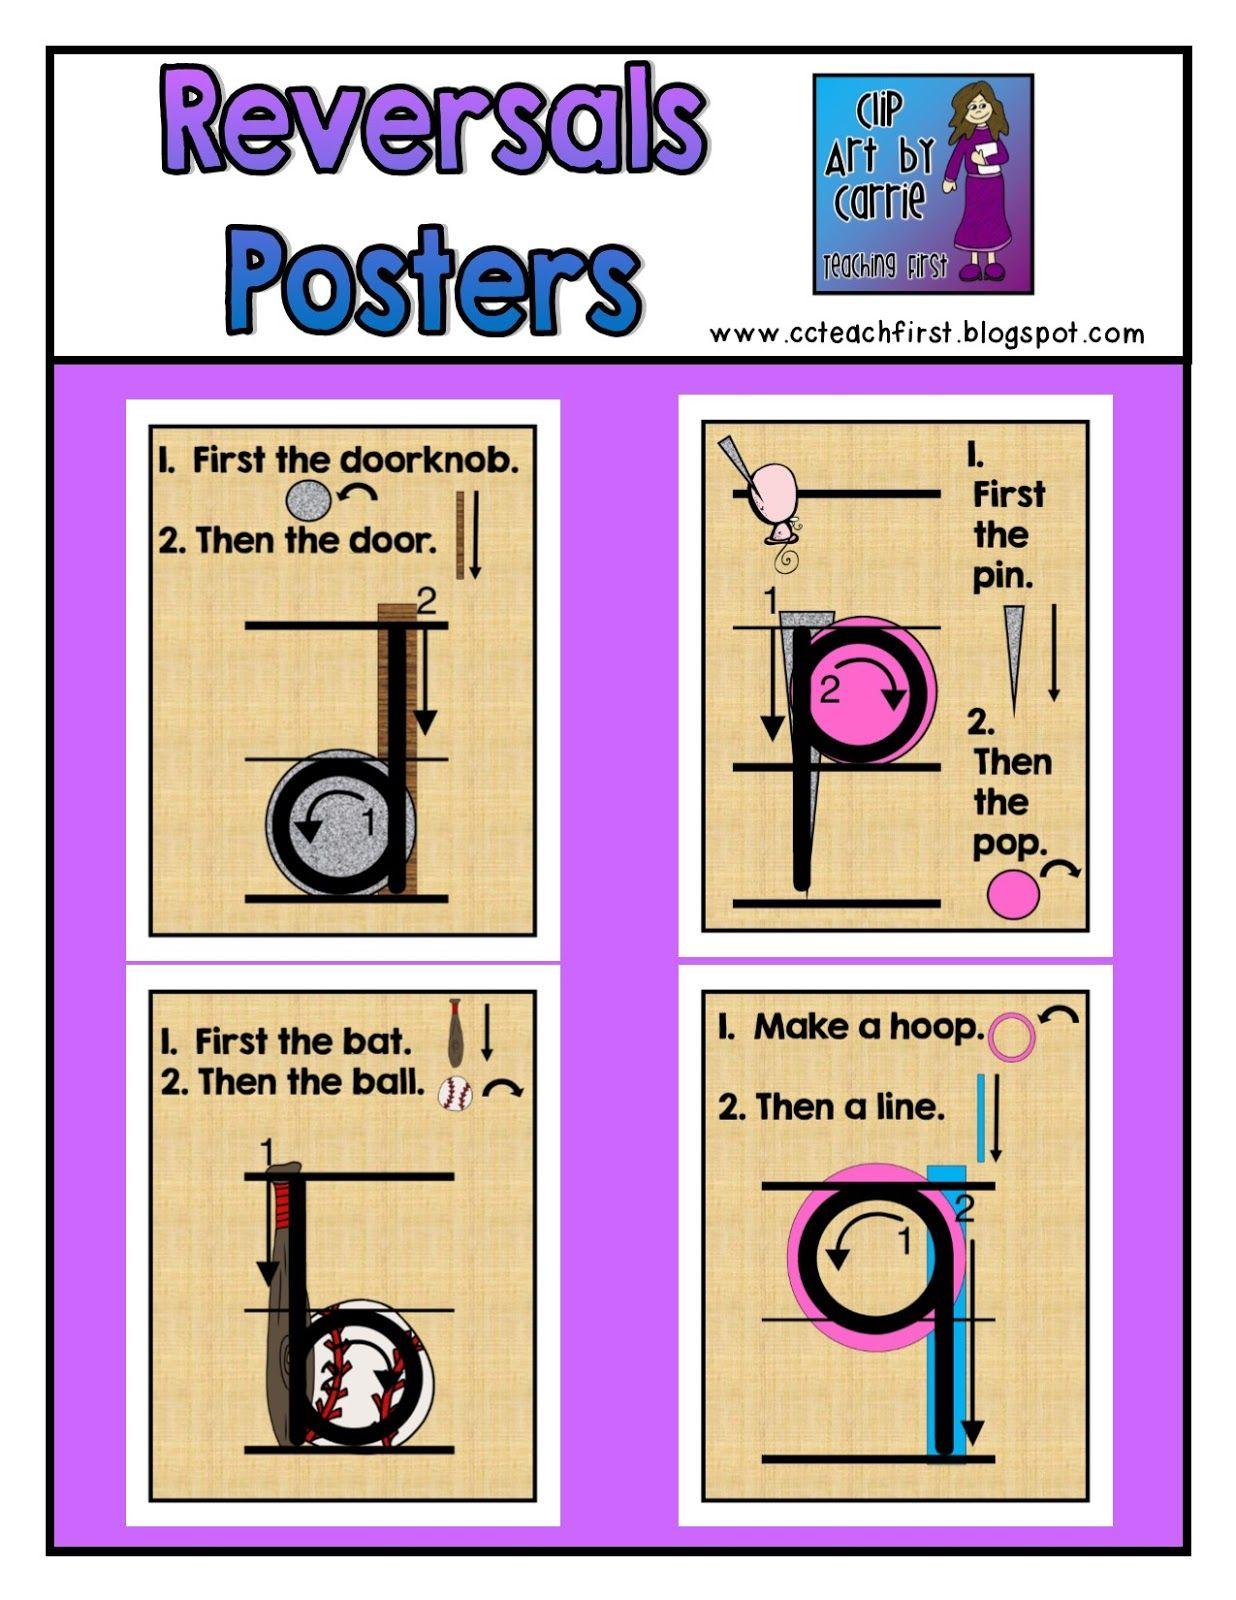 Clip Art By Carrie Teaching First B D P 9 Reversal Posters Freebie Letter Reversals Teaching Posters Alphabet Activities Preschool [ 1600 x 1236 Pixel ]